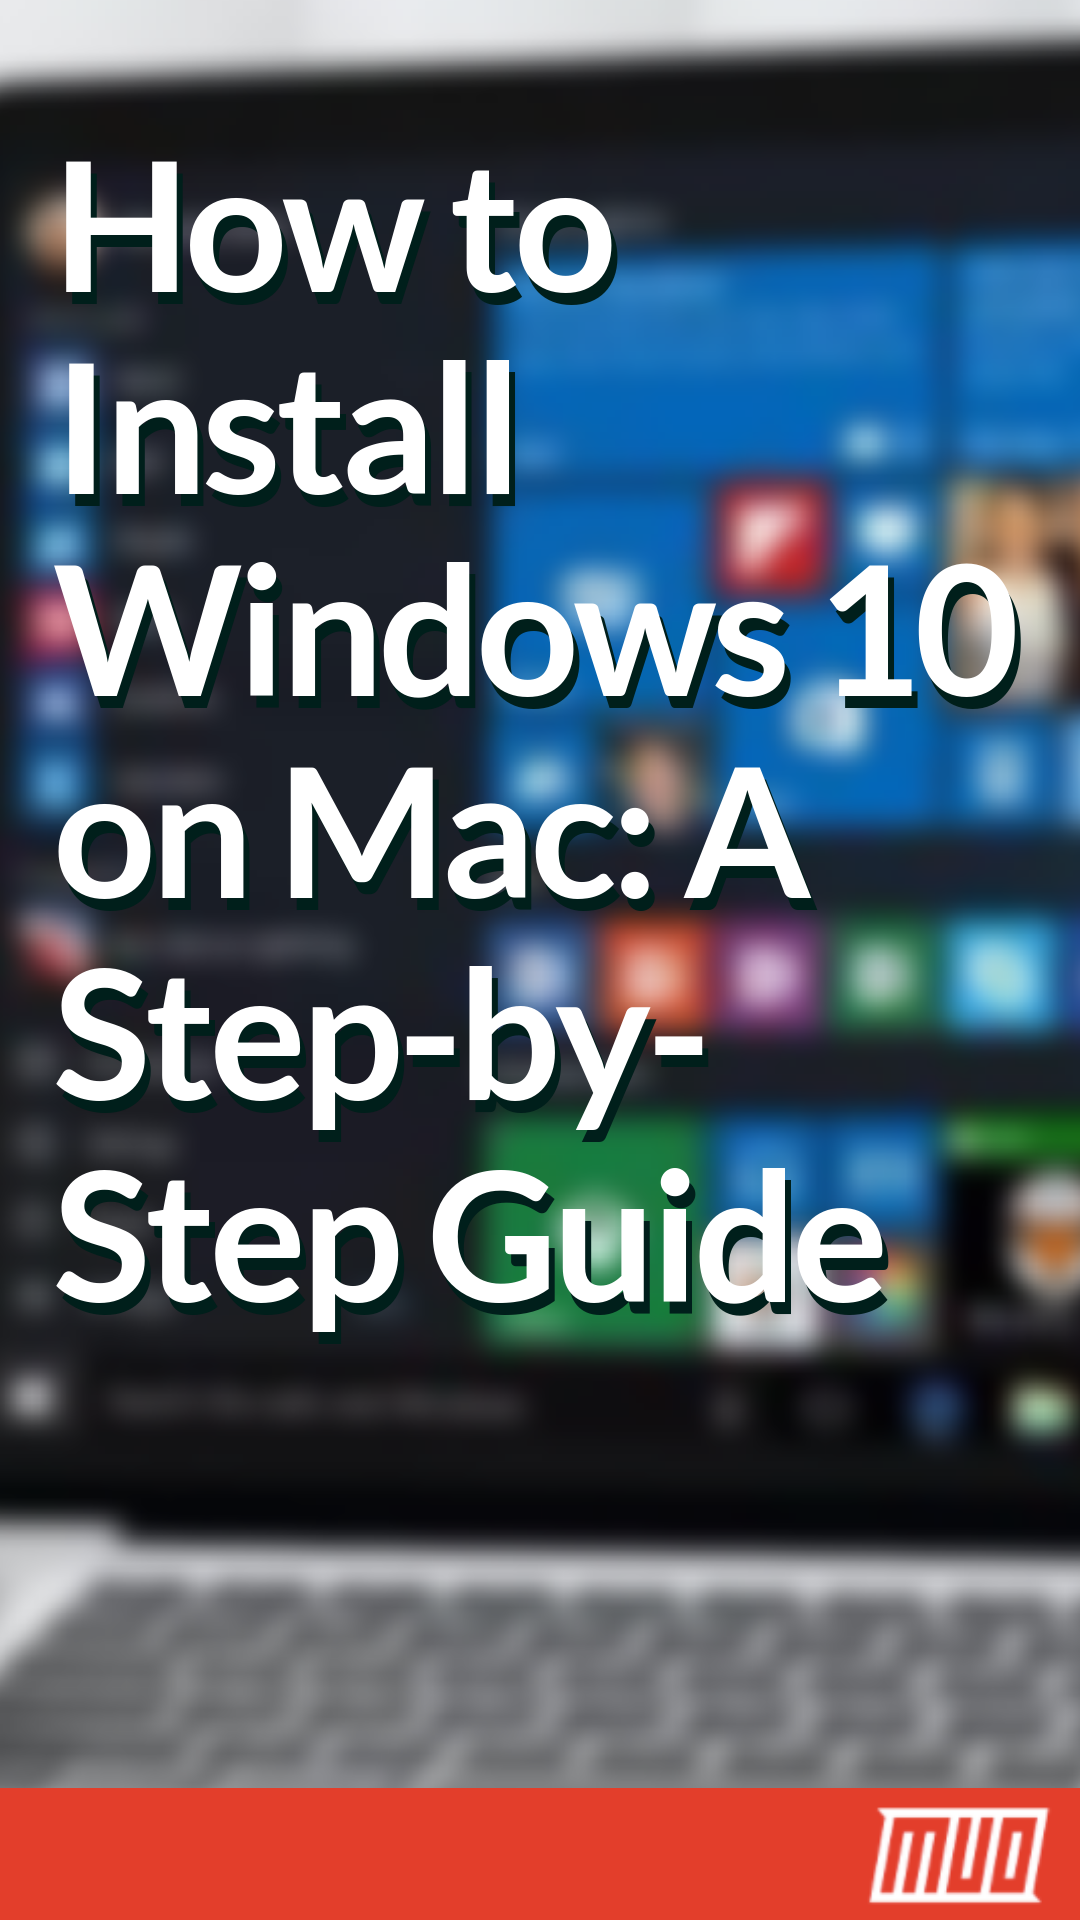 create usb install windows 10 on mac